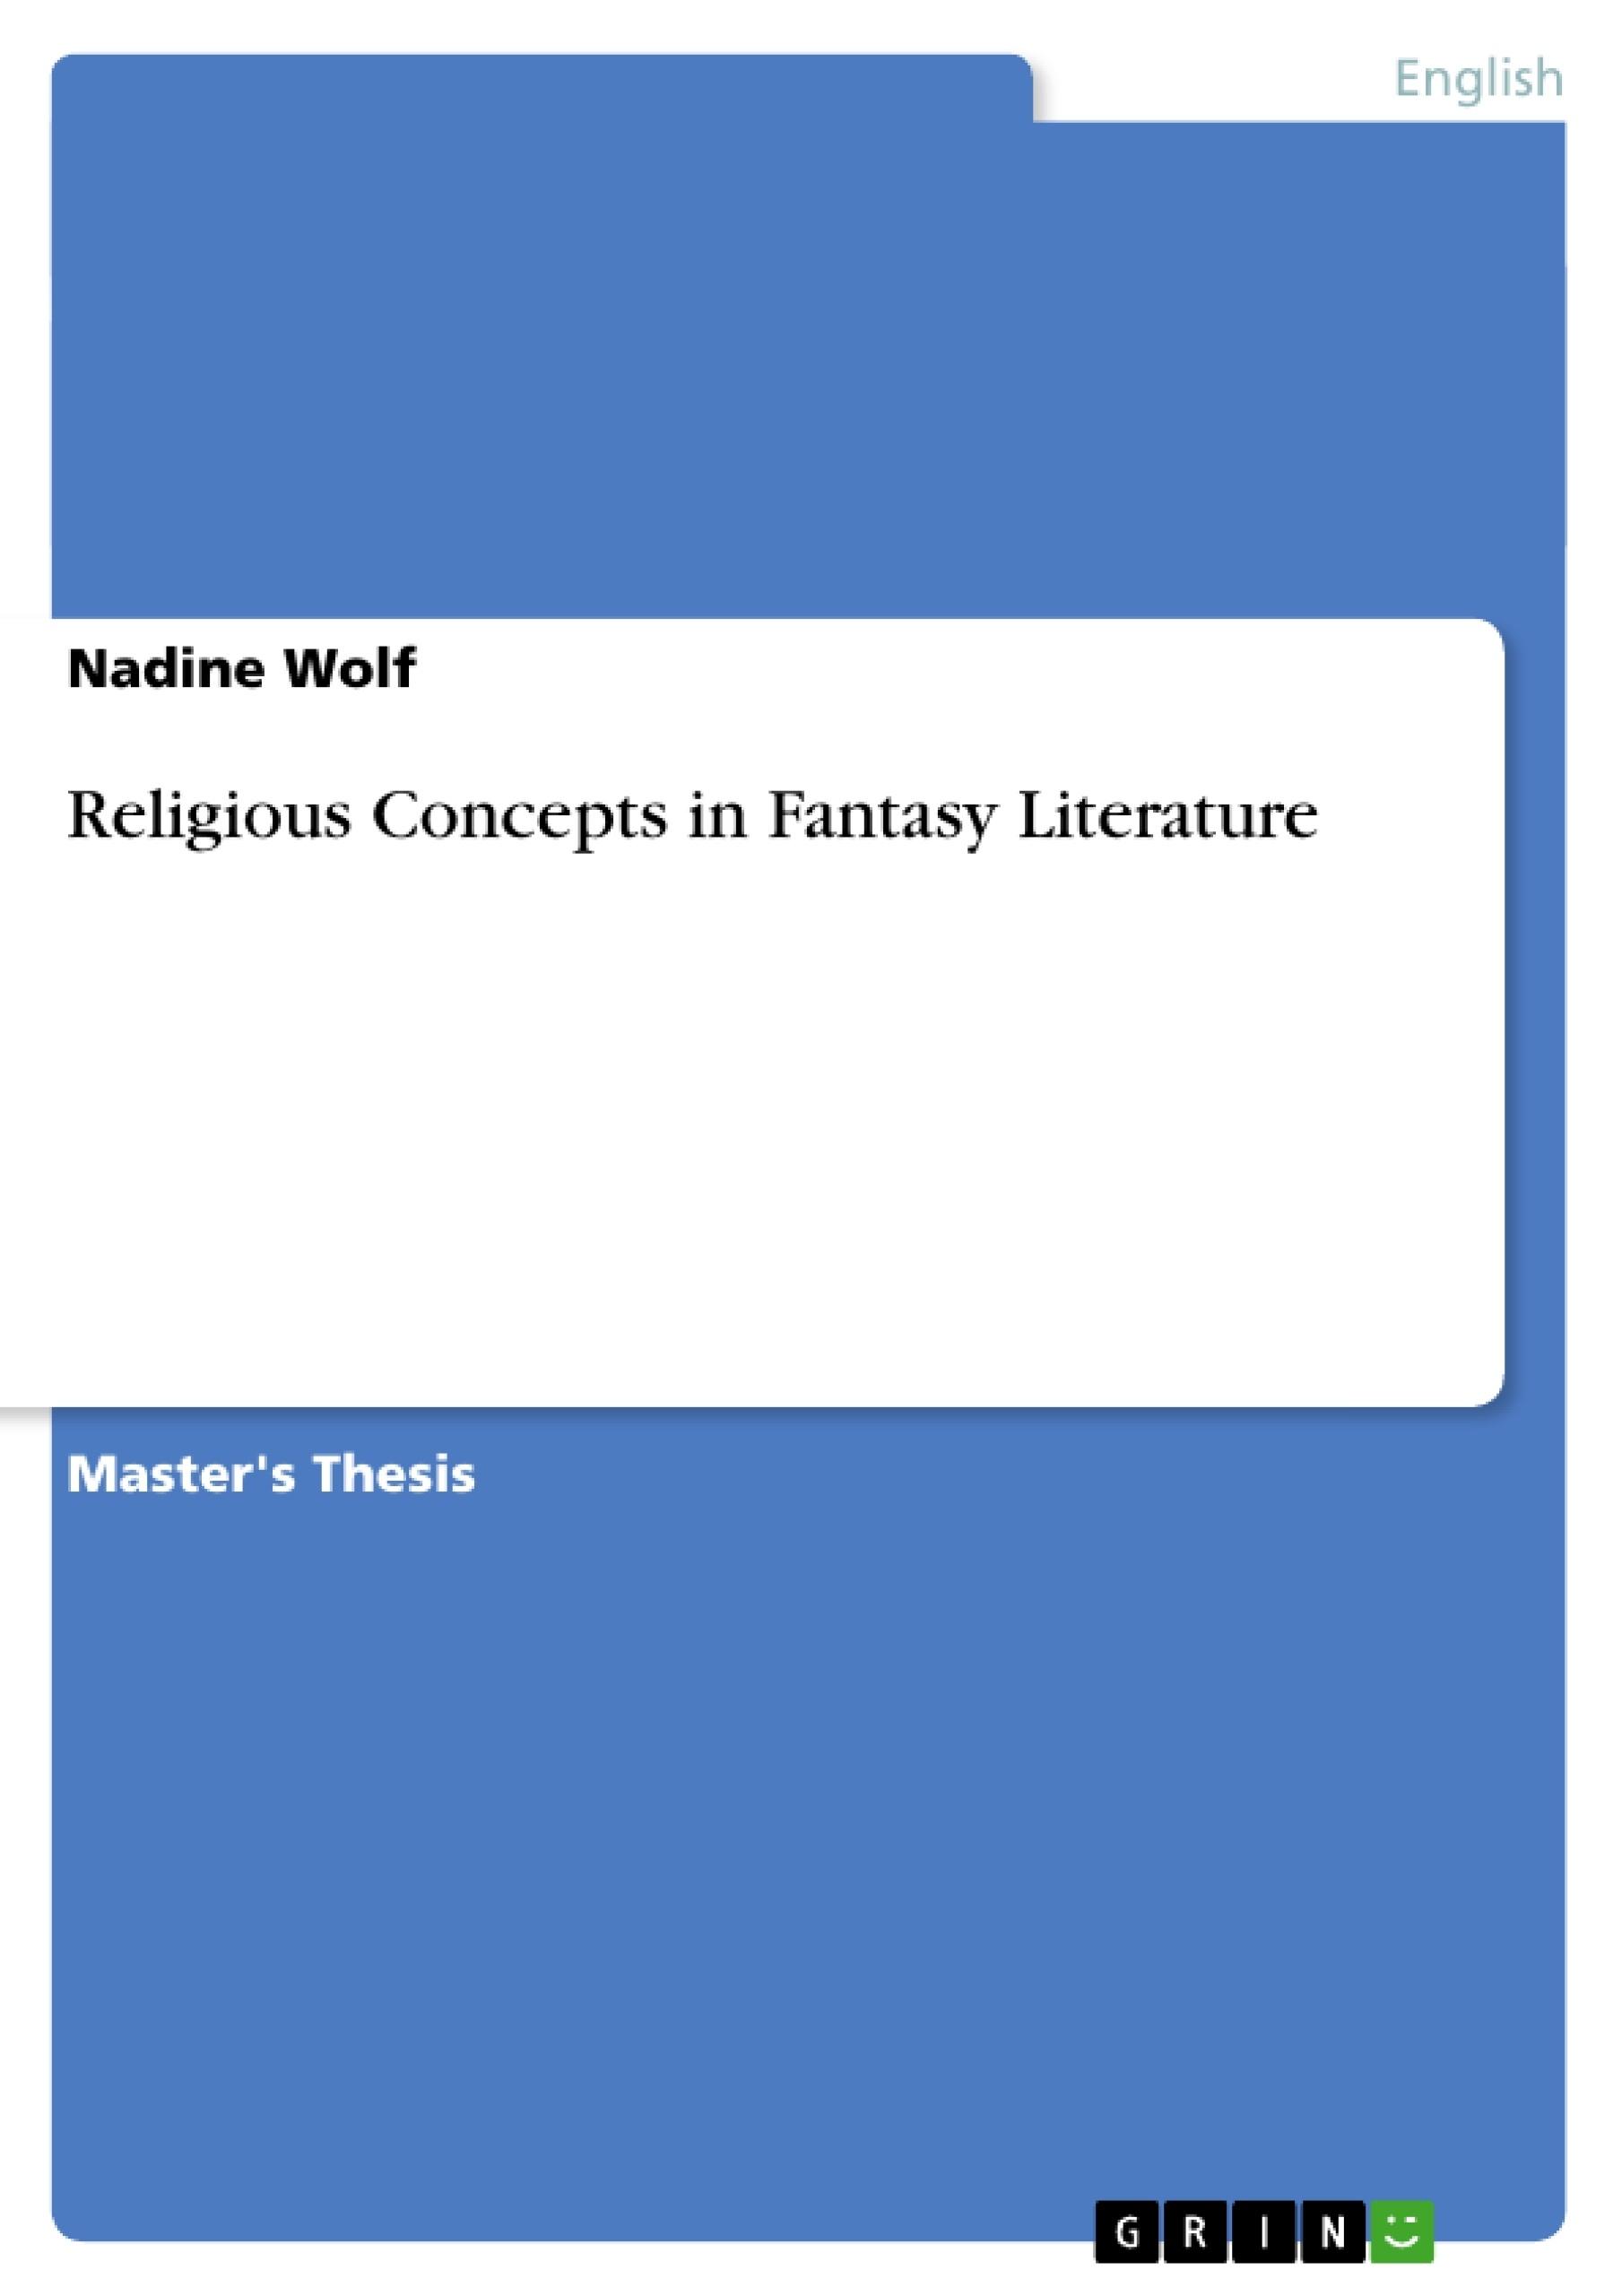 Title: Religious Concepts in Fantasy Literature